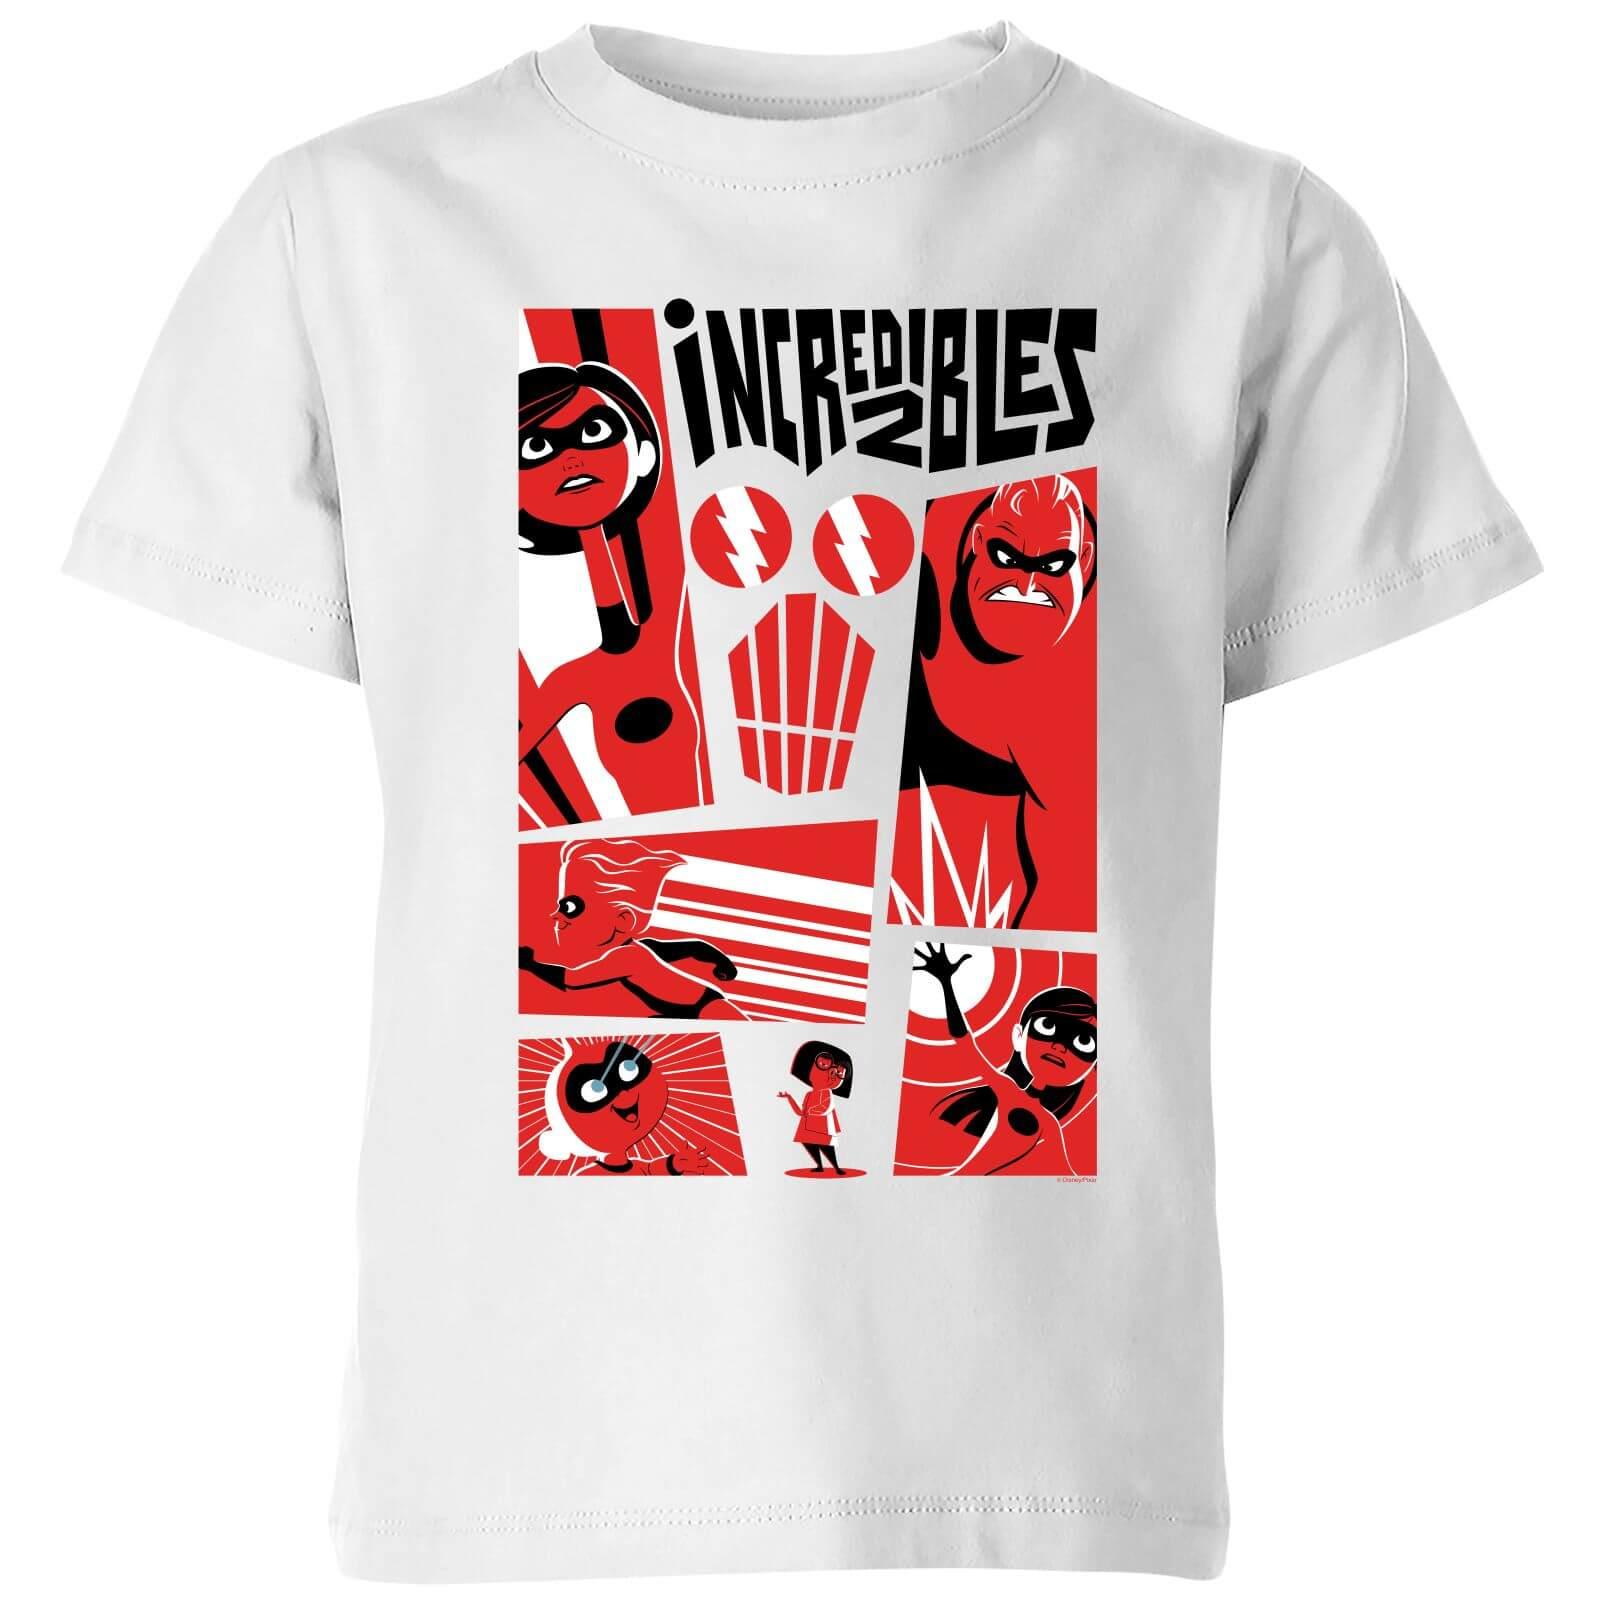 d6e31770df30 ... the incredibles 2 poster kids t shirt white iwoot; com disney ...